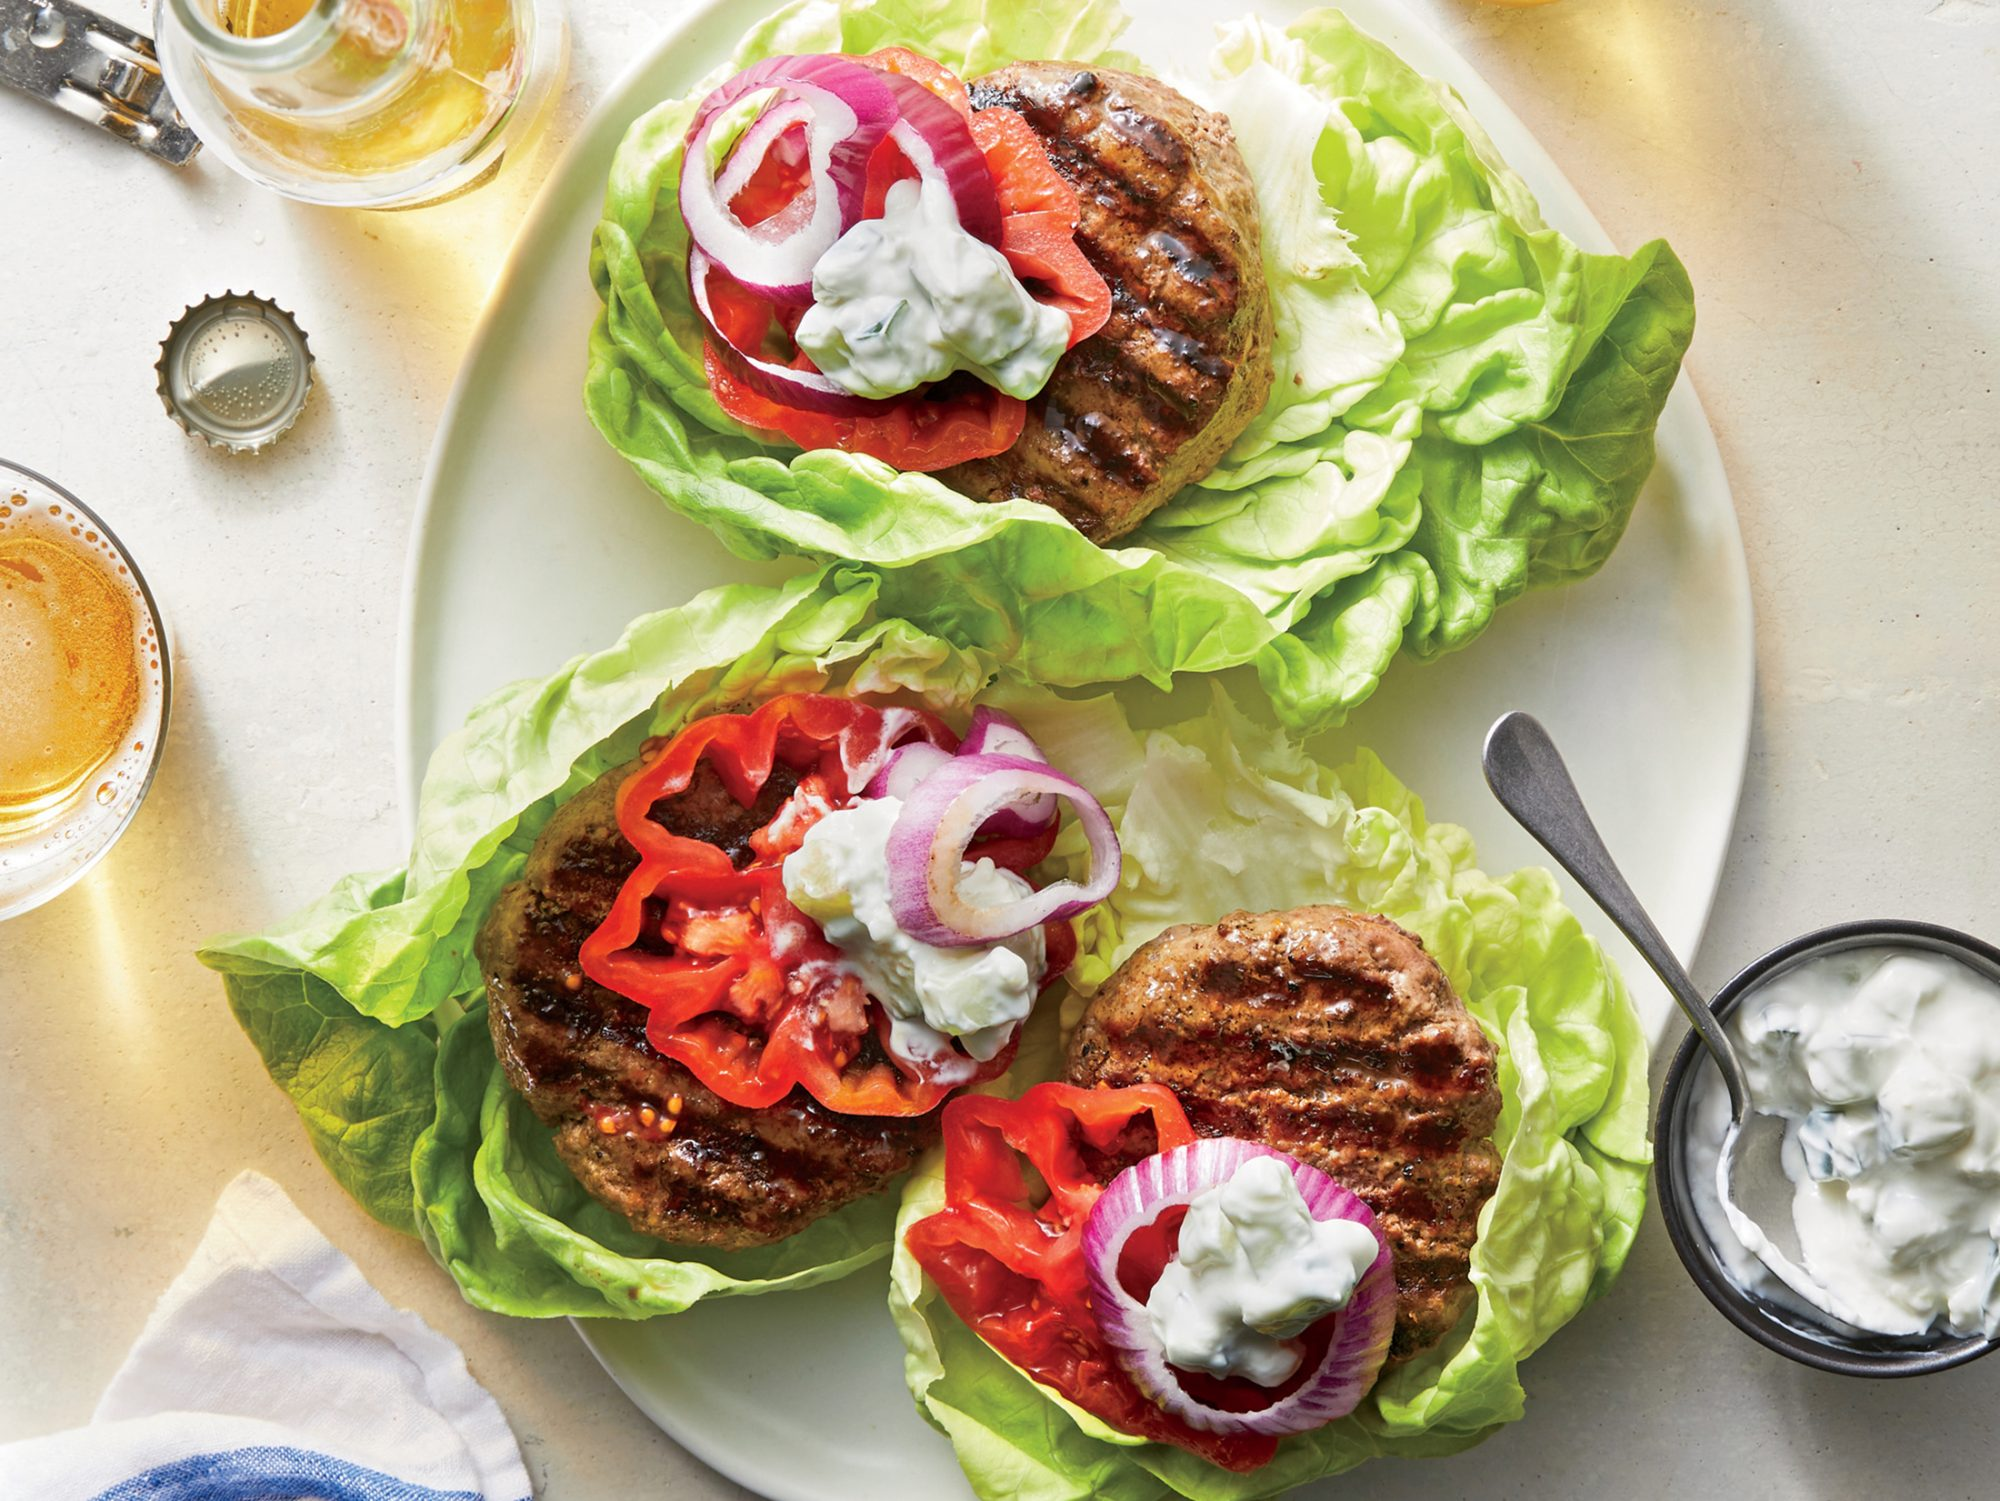 Grilled Beef-Mushroom Burgers